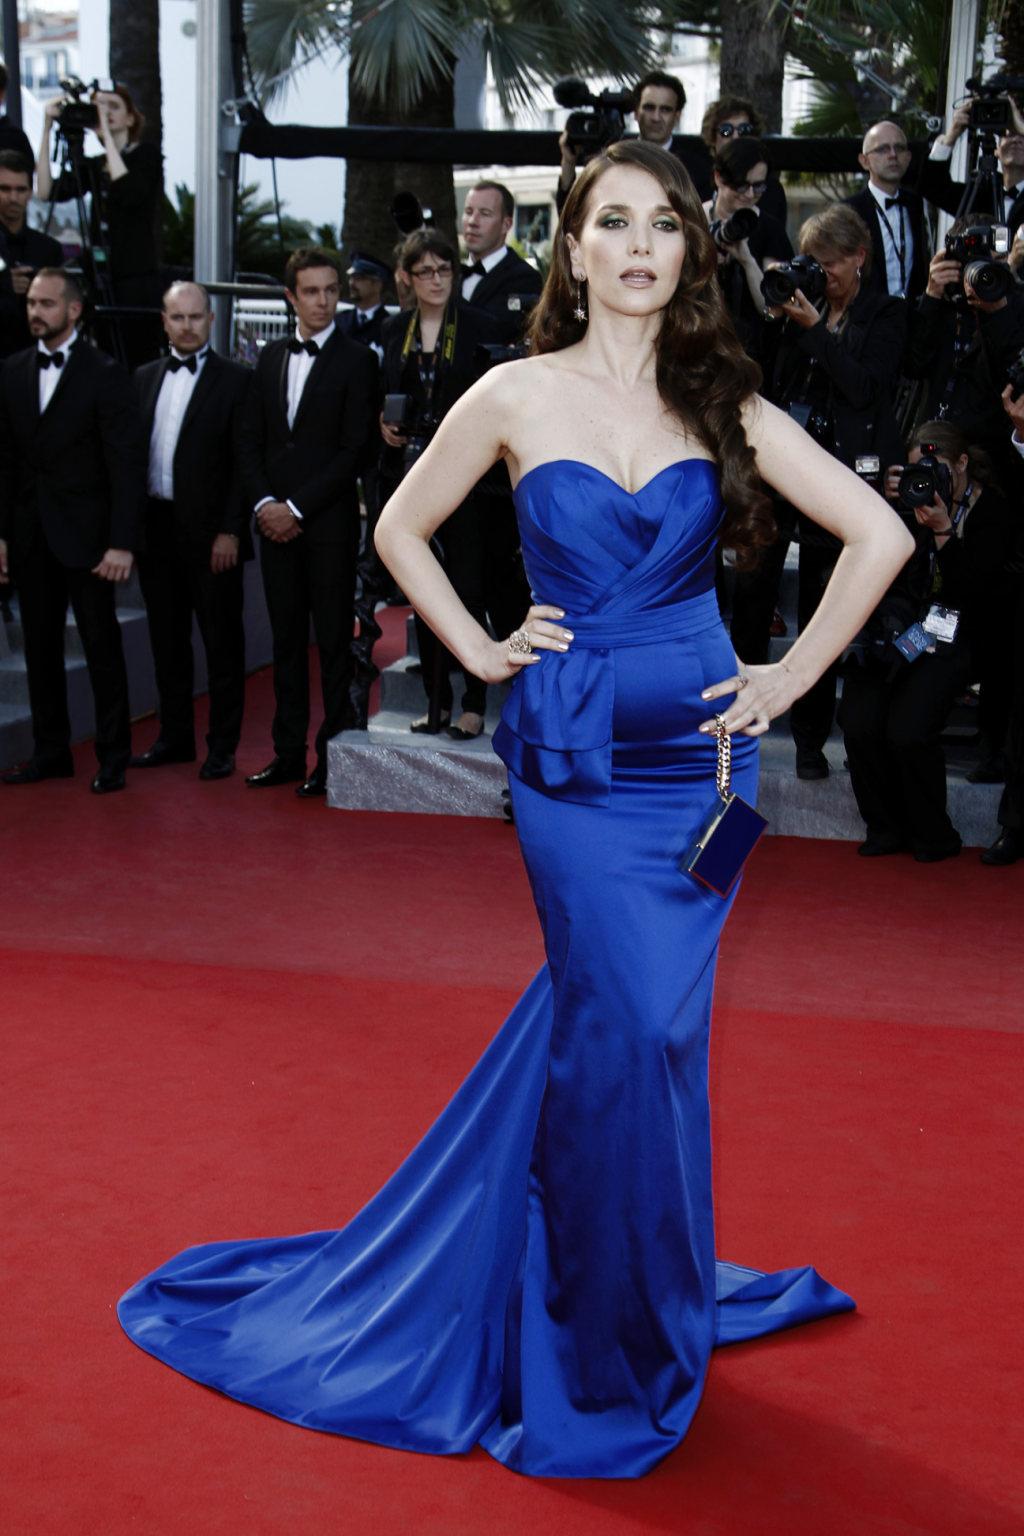 http://2.bp.blogspot.com/-XD79iFgl478/T75_0KYXDpI/AAAAAAAADms/n06K2txNfsM/s1600/Natalia+Oreiro+Cannes+%25285%2529.jpeg